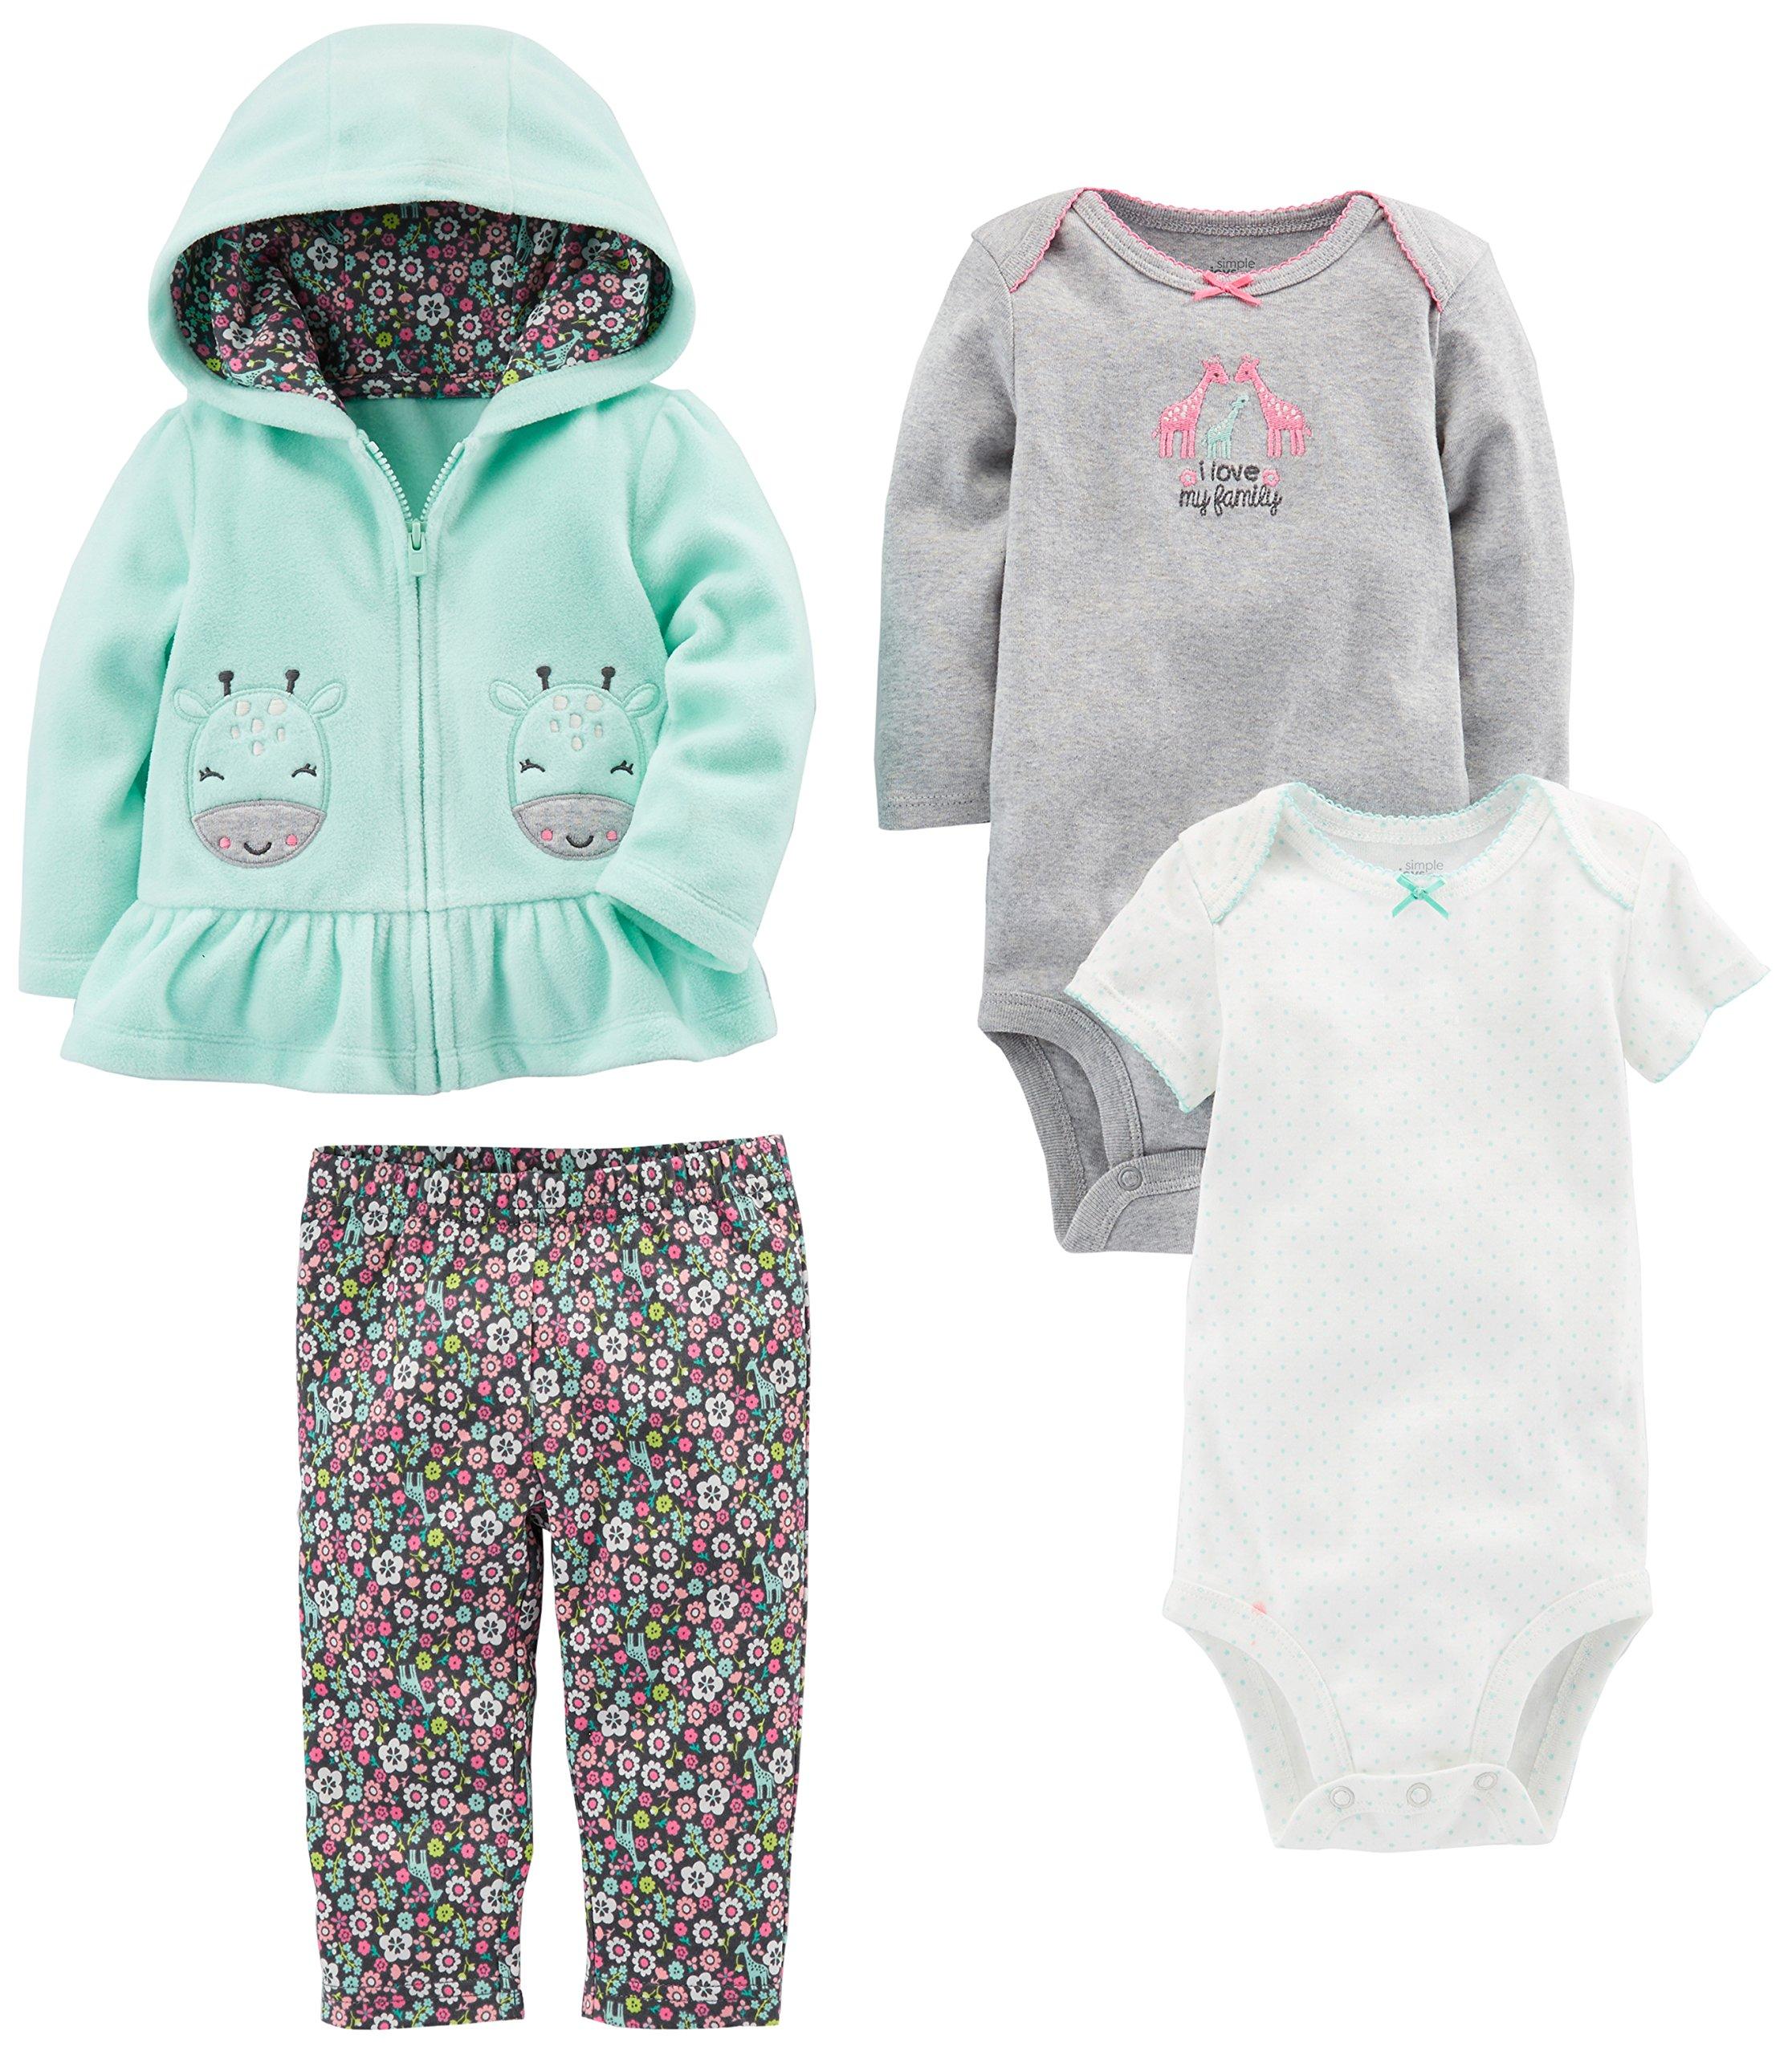 d739ee54ecff31 Simple Joys by Carter's Baby Girls' 4-Piece Fleece Jacket, Pant, and  Bodysuit Set